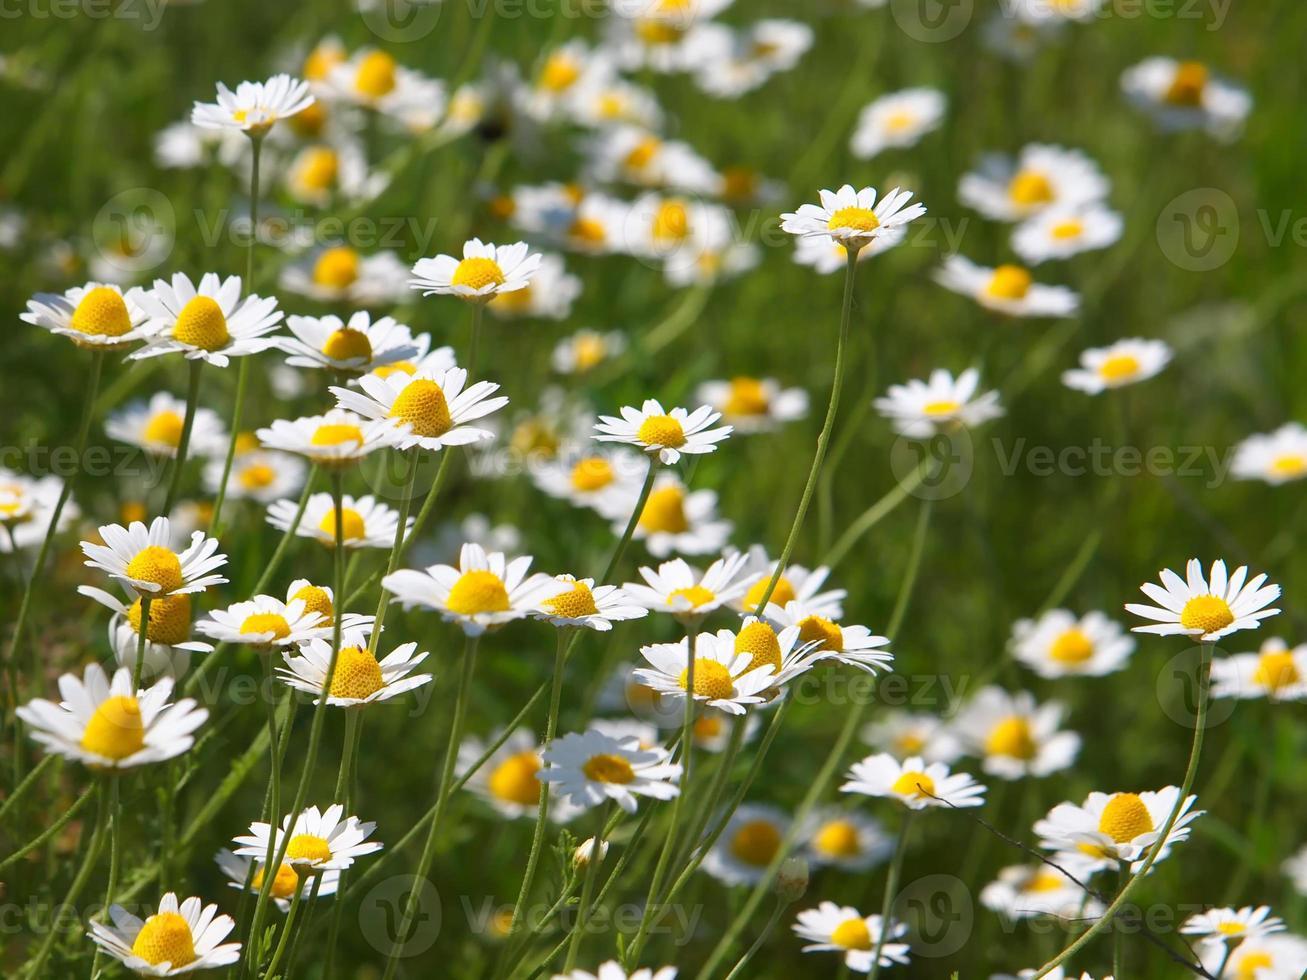 anthemis arvensis planta y flores foto